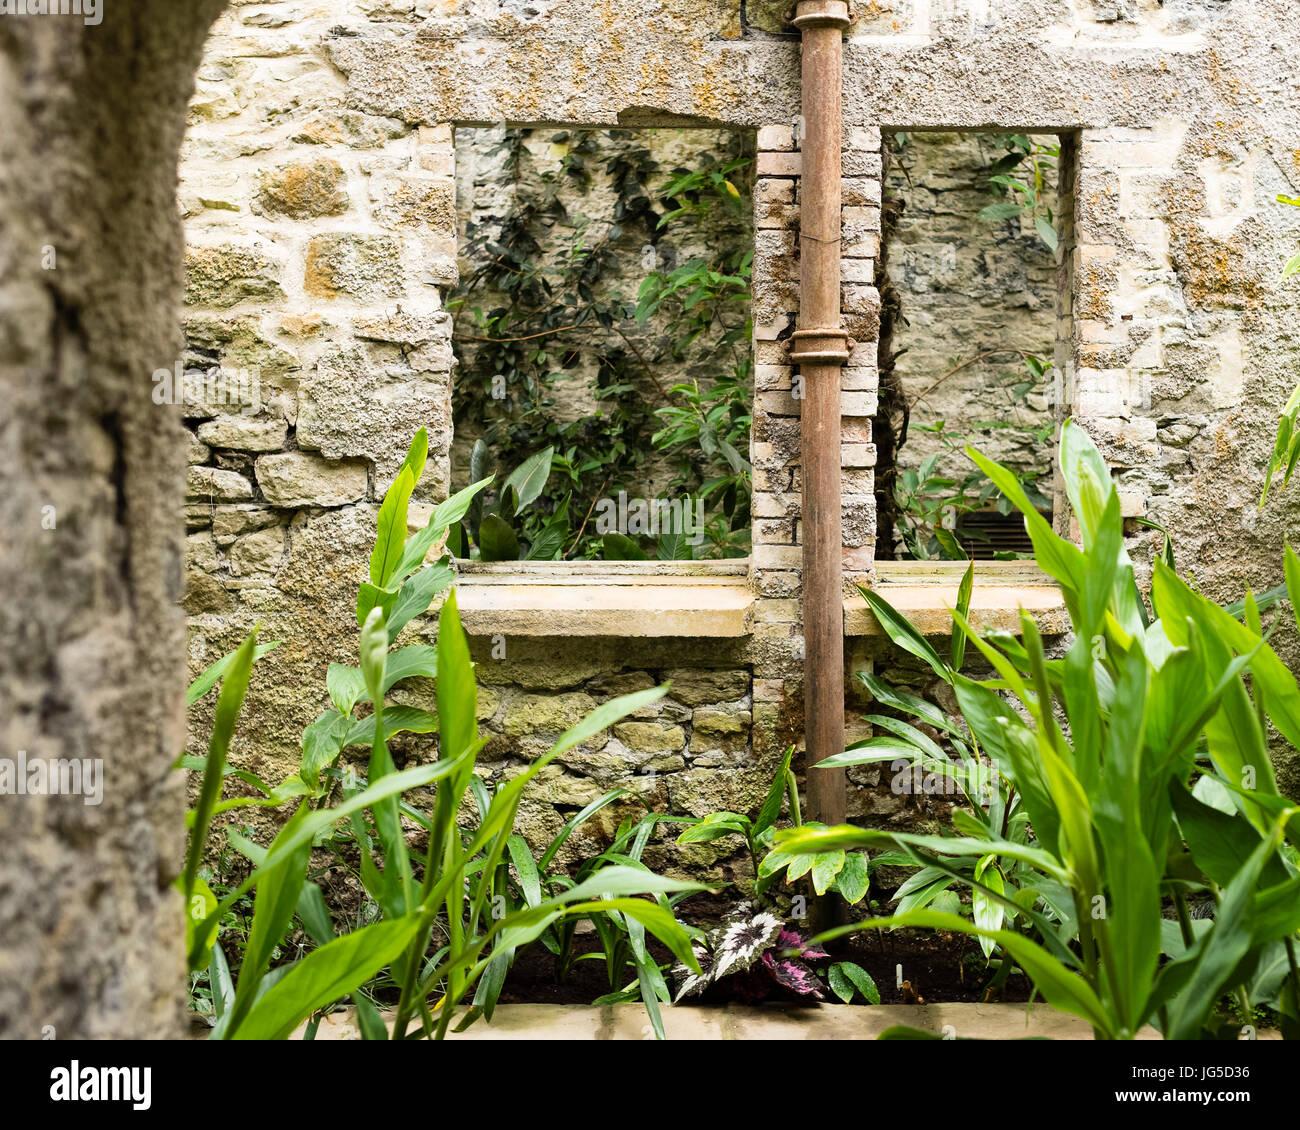 The subtropical indoor garden at Aberglasney, Carmarthenshire, Wales, UK - Stock Image